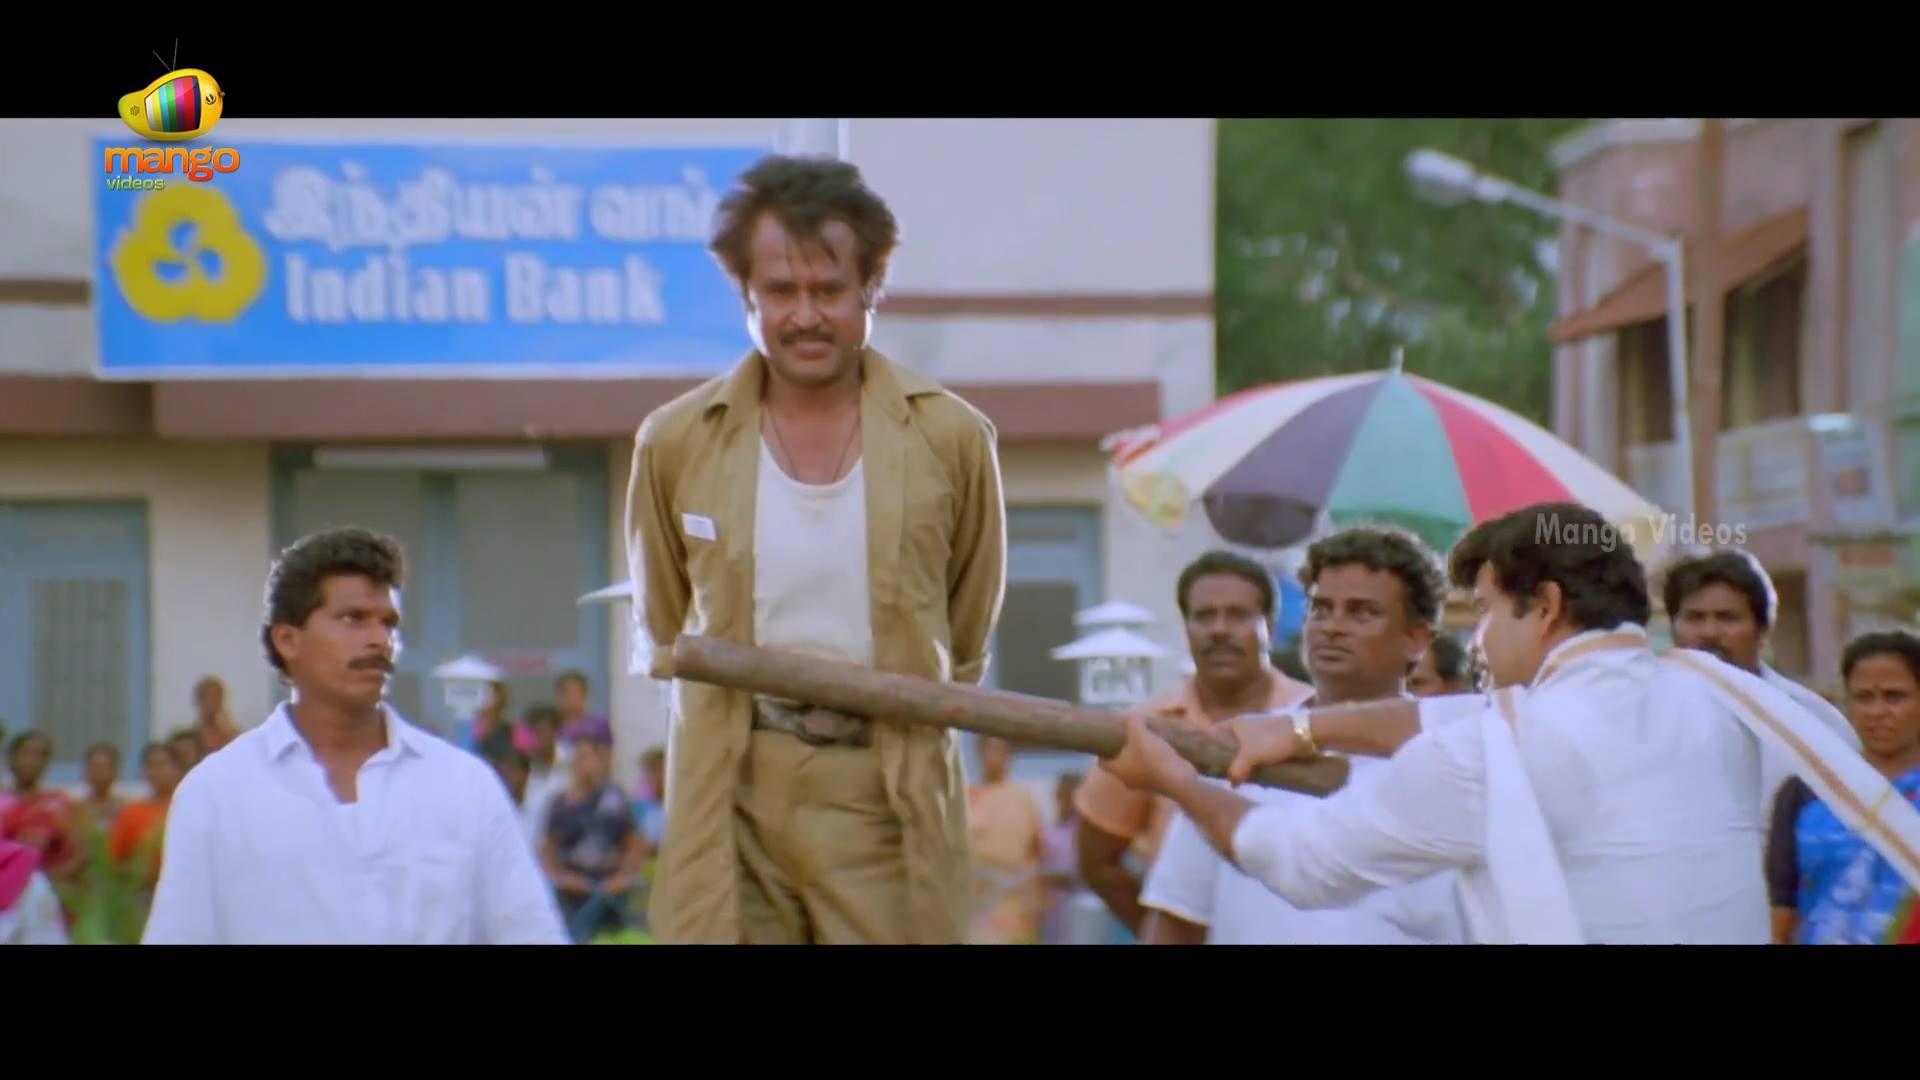 Basha Tamil Meme Templates 57 Kakakapo